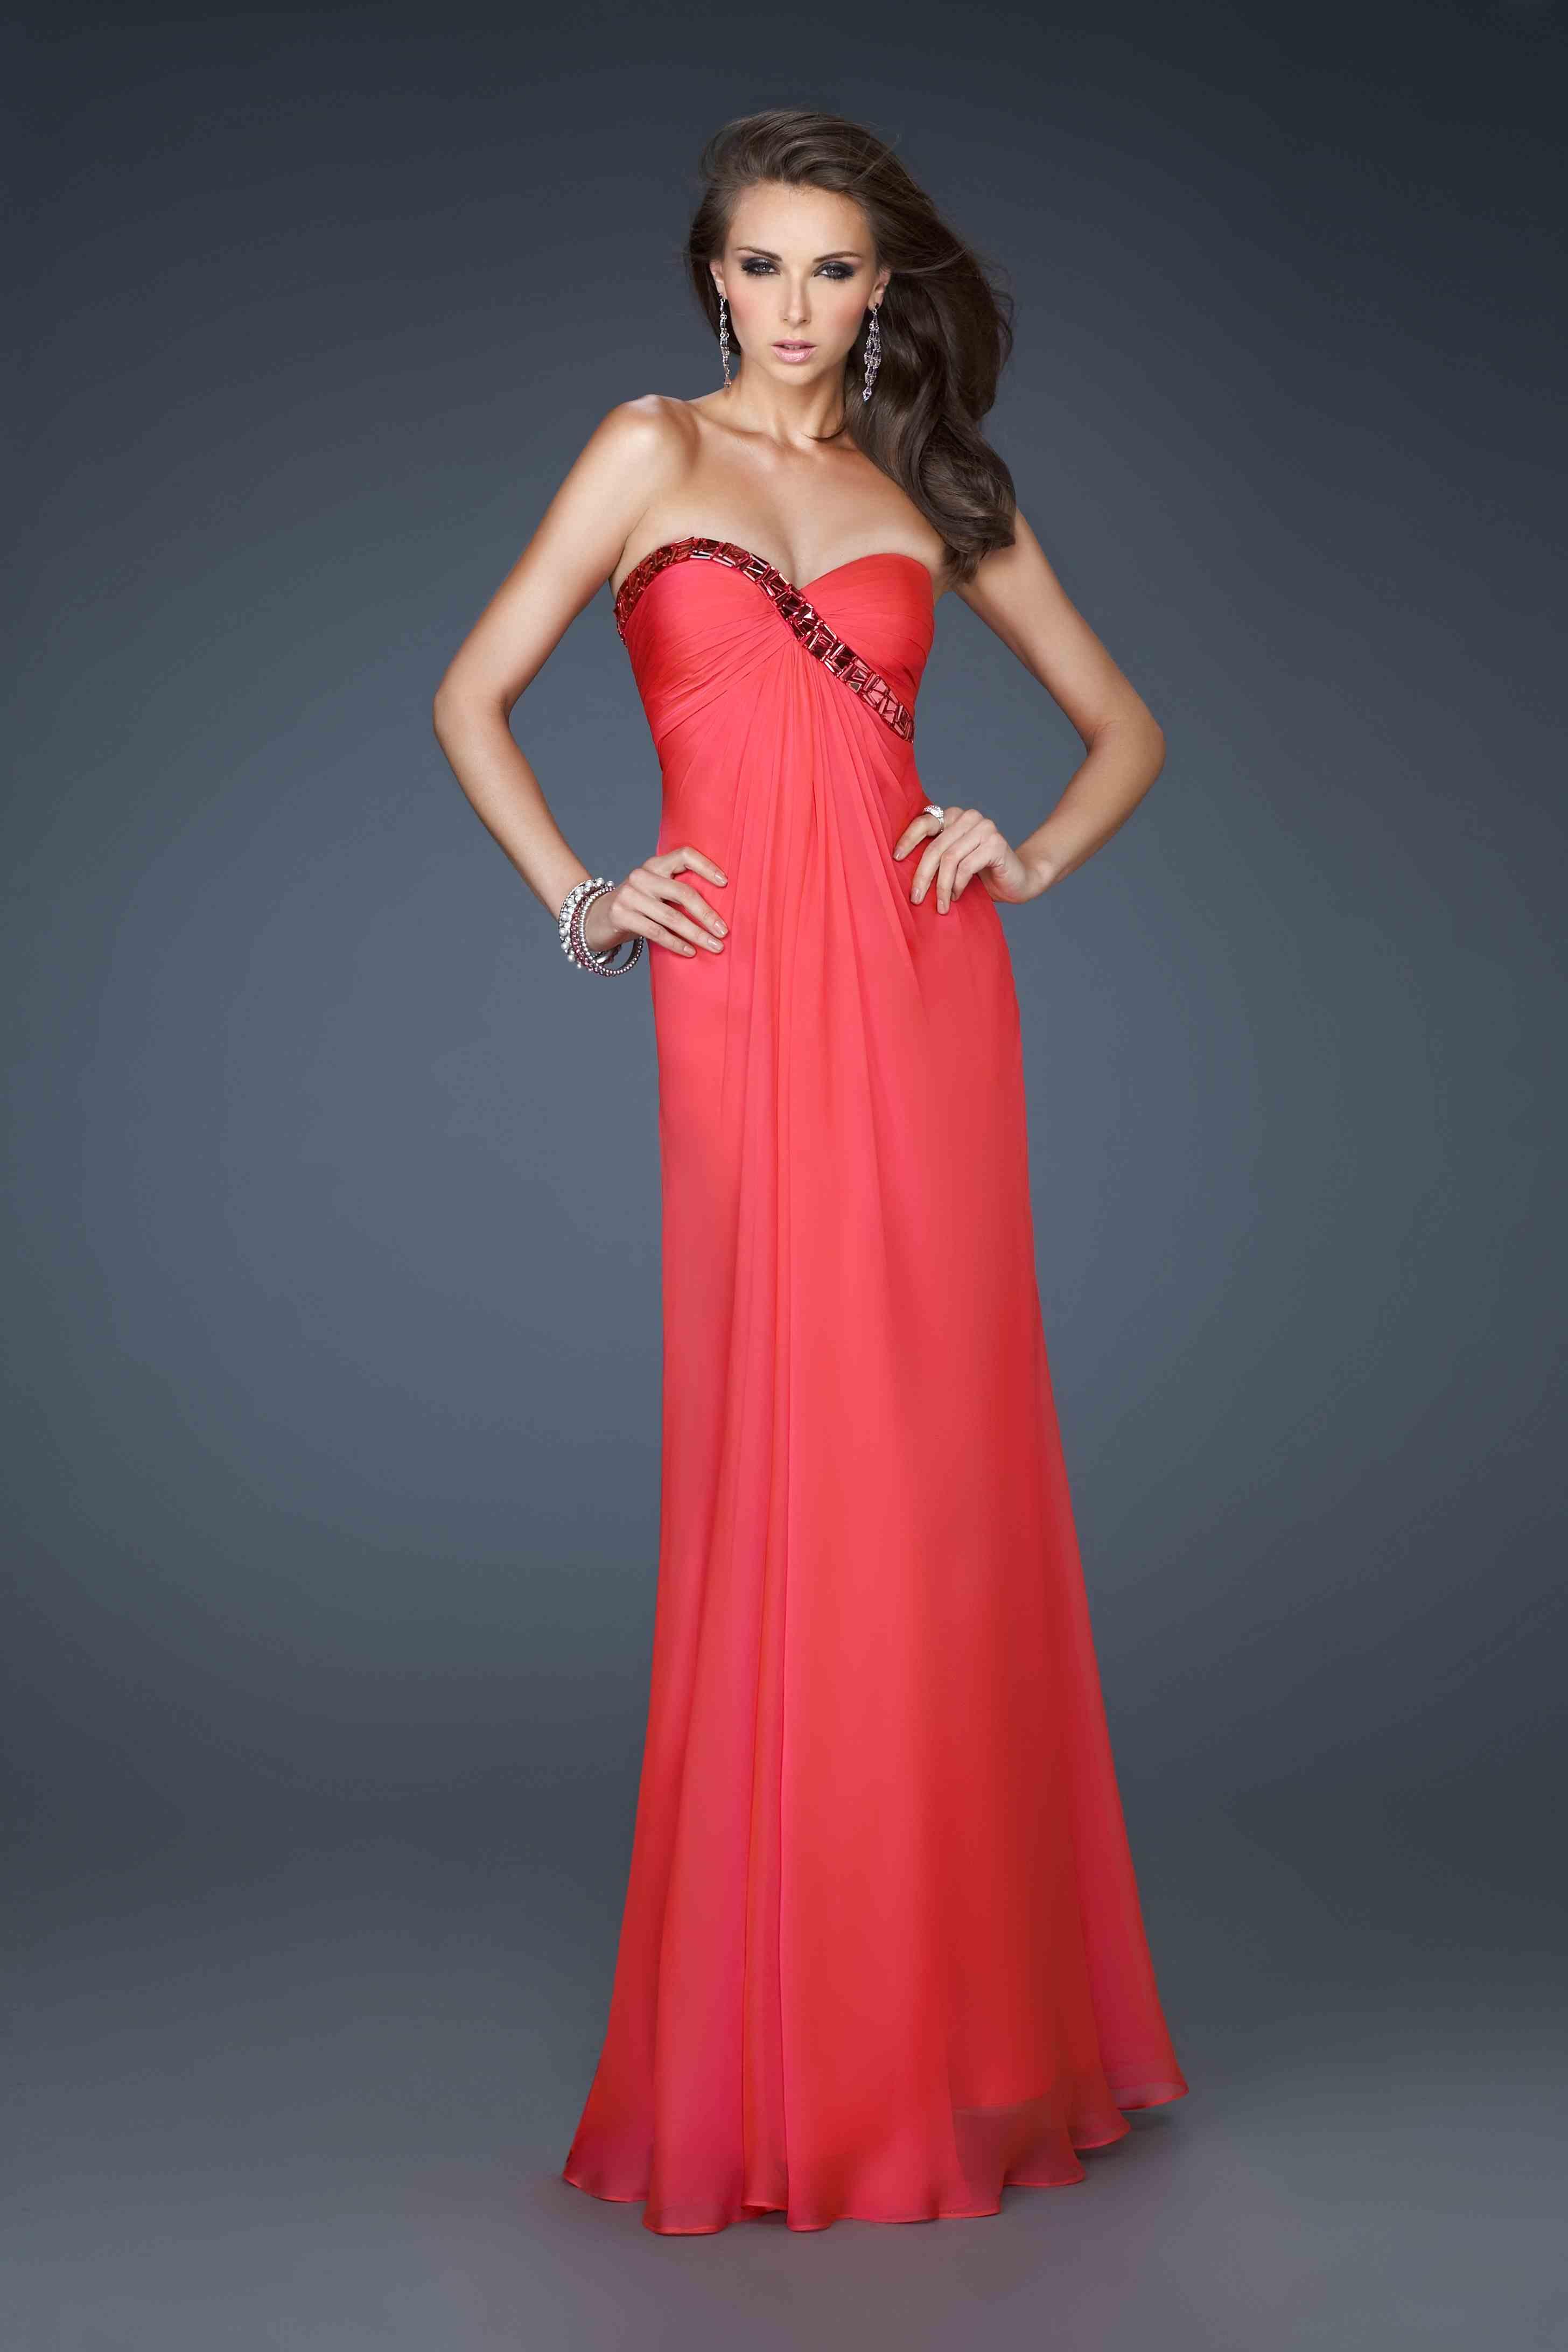 La Prom Dresses Red Prom Dresses